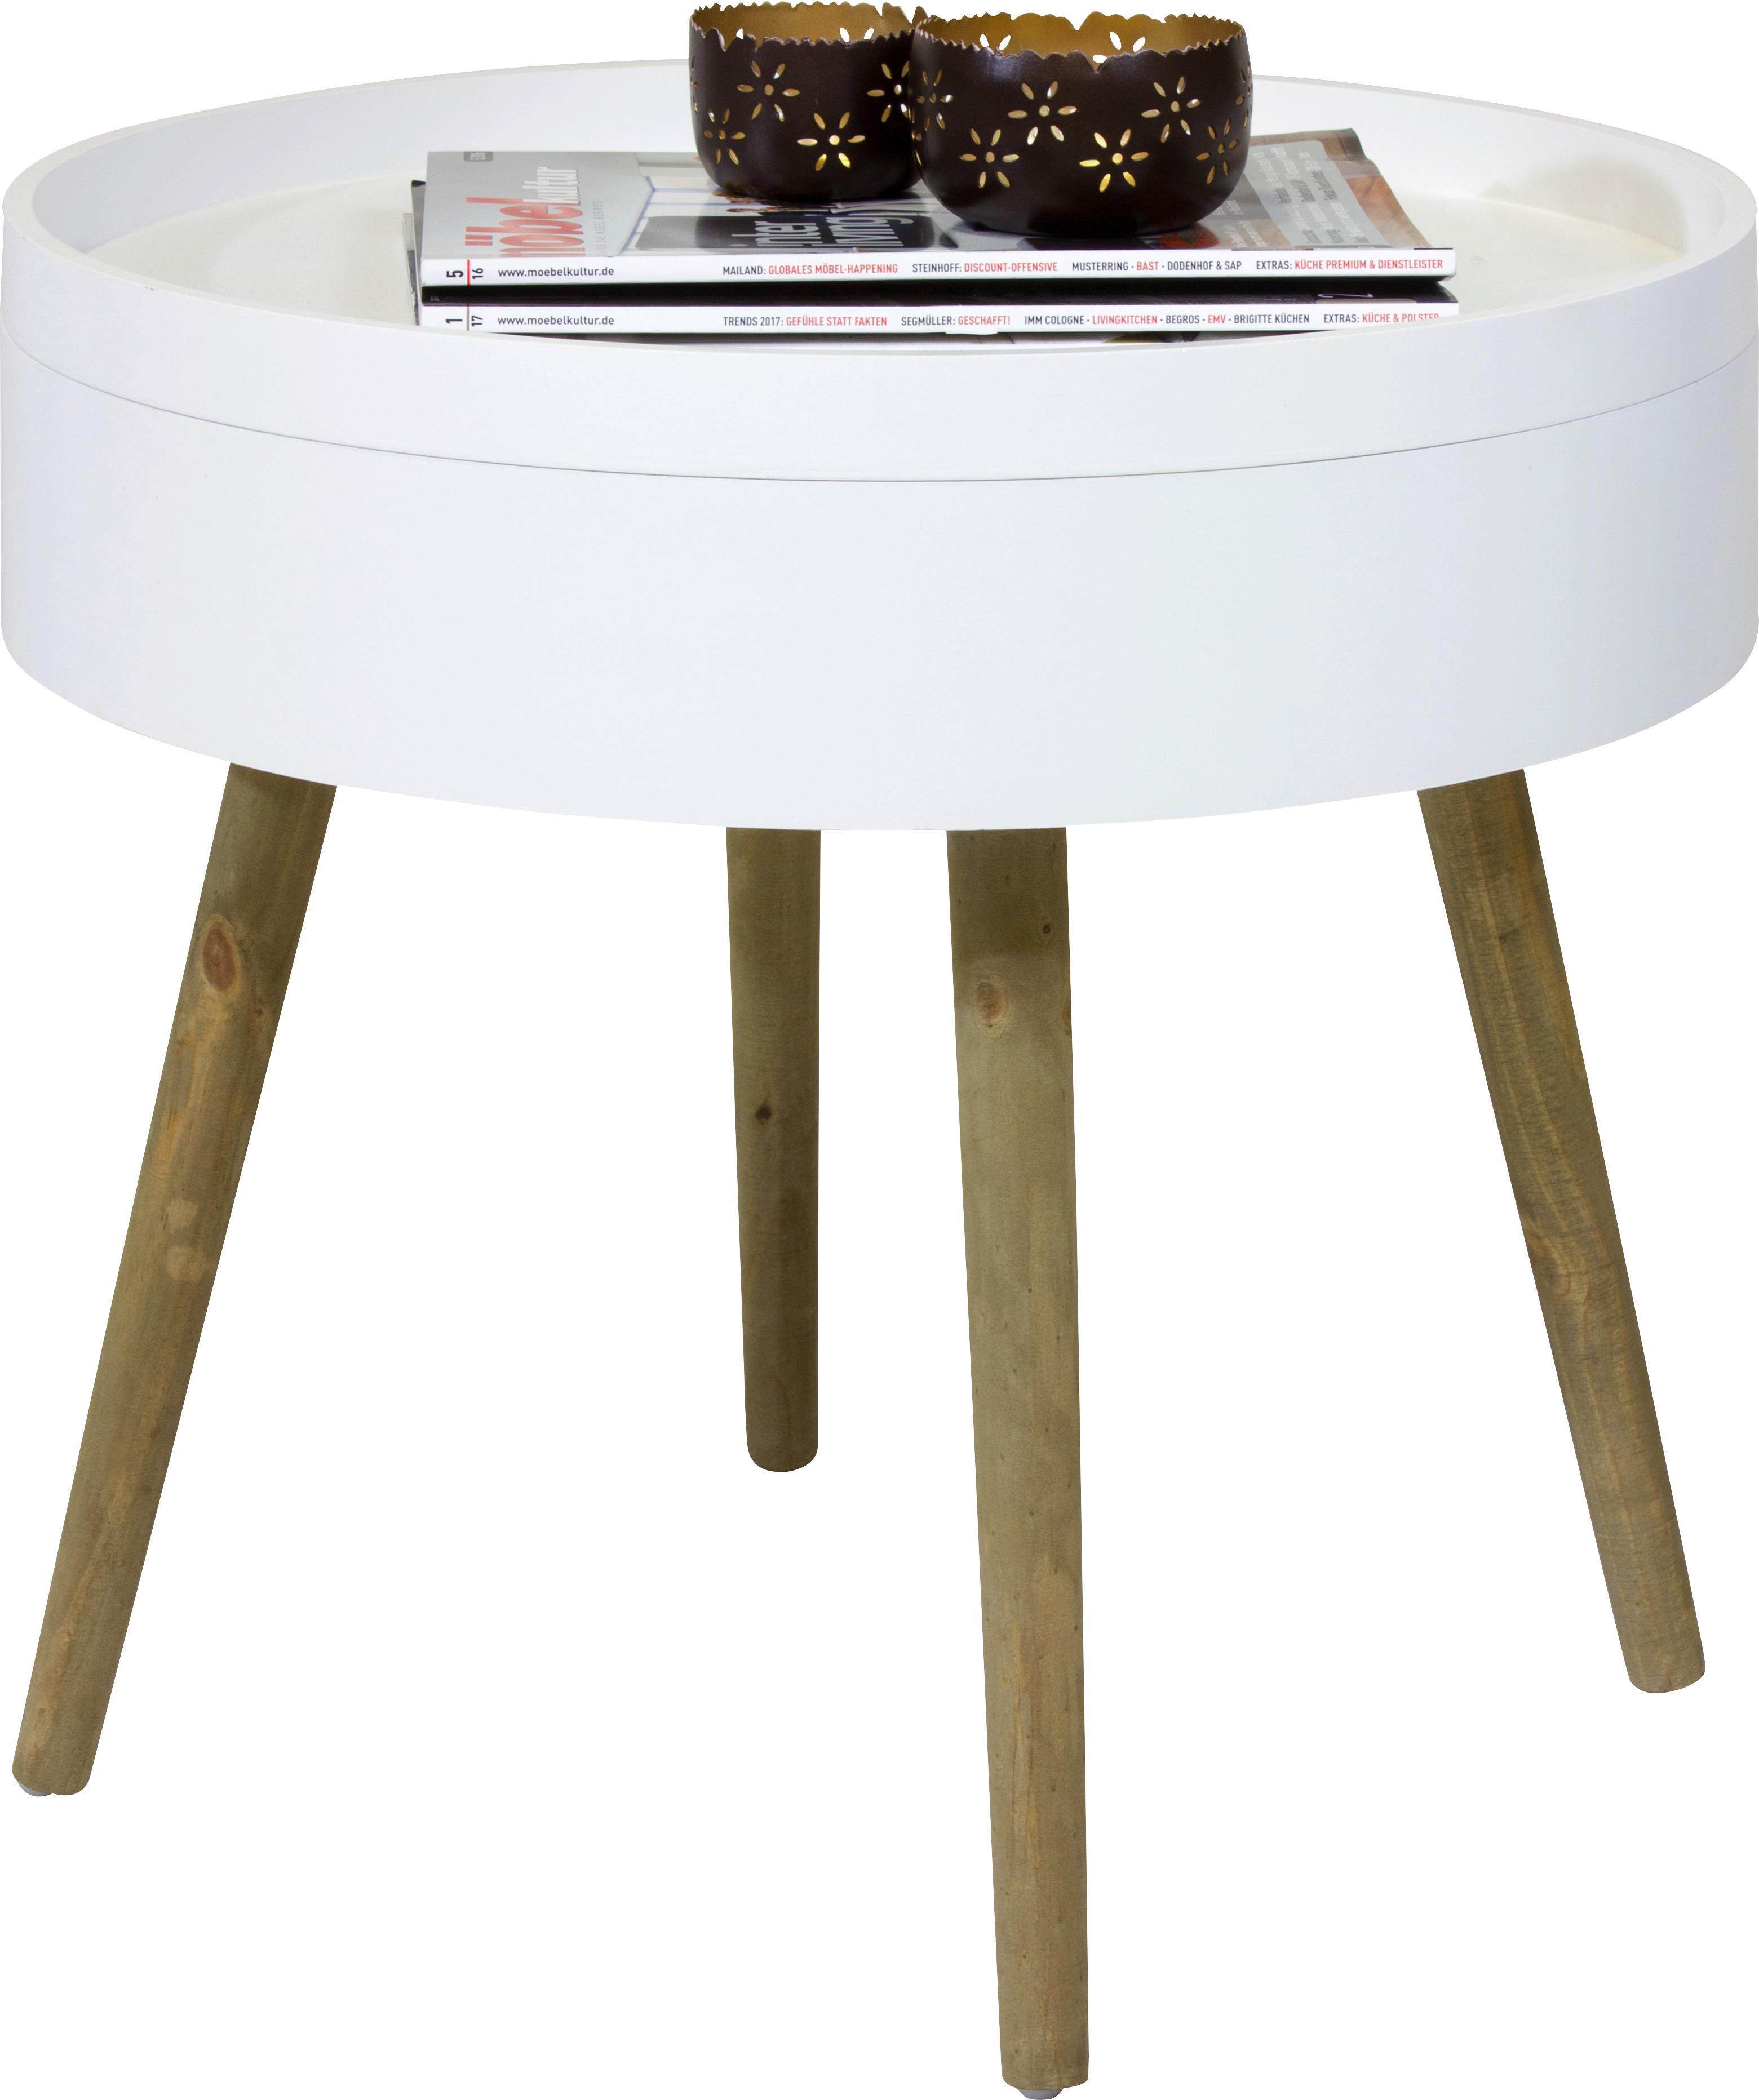 esstische dodenhof. Black Bedroom Furniture Sets. Home Design Ideas